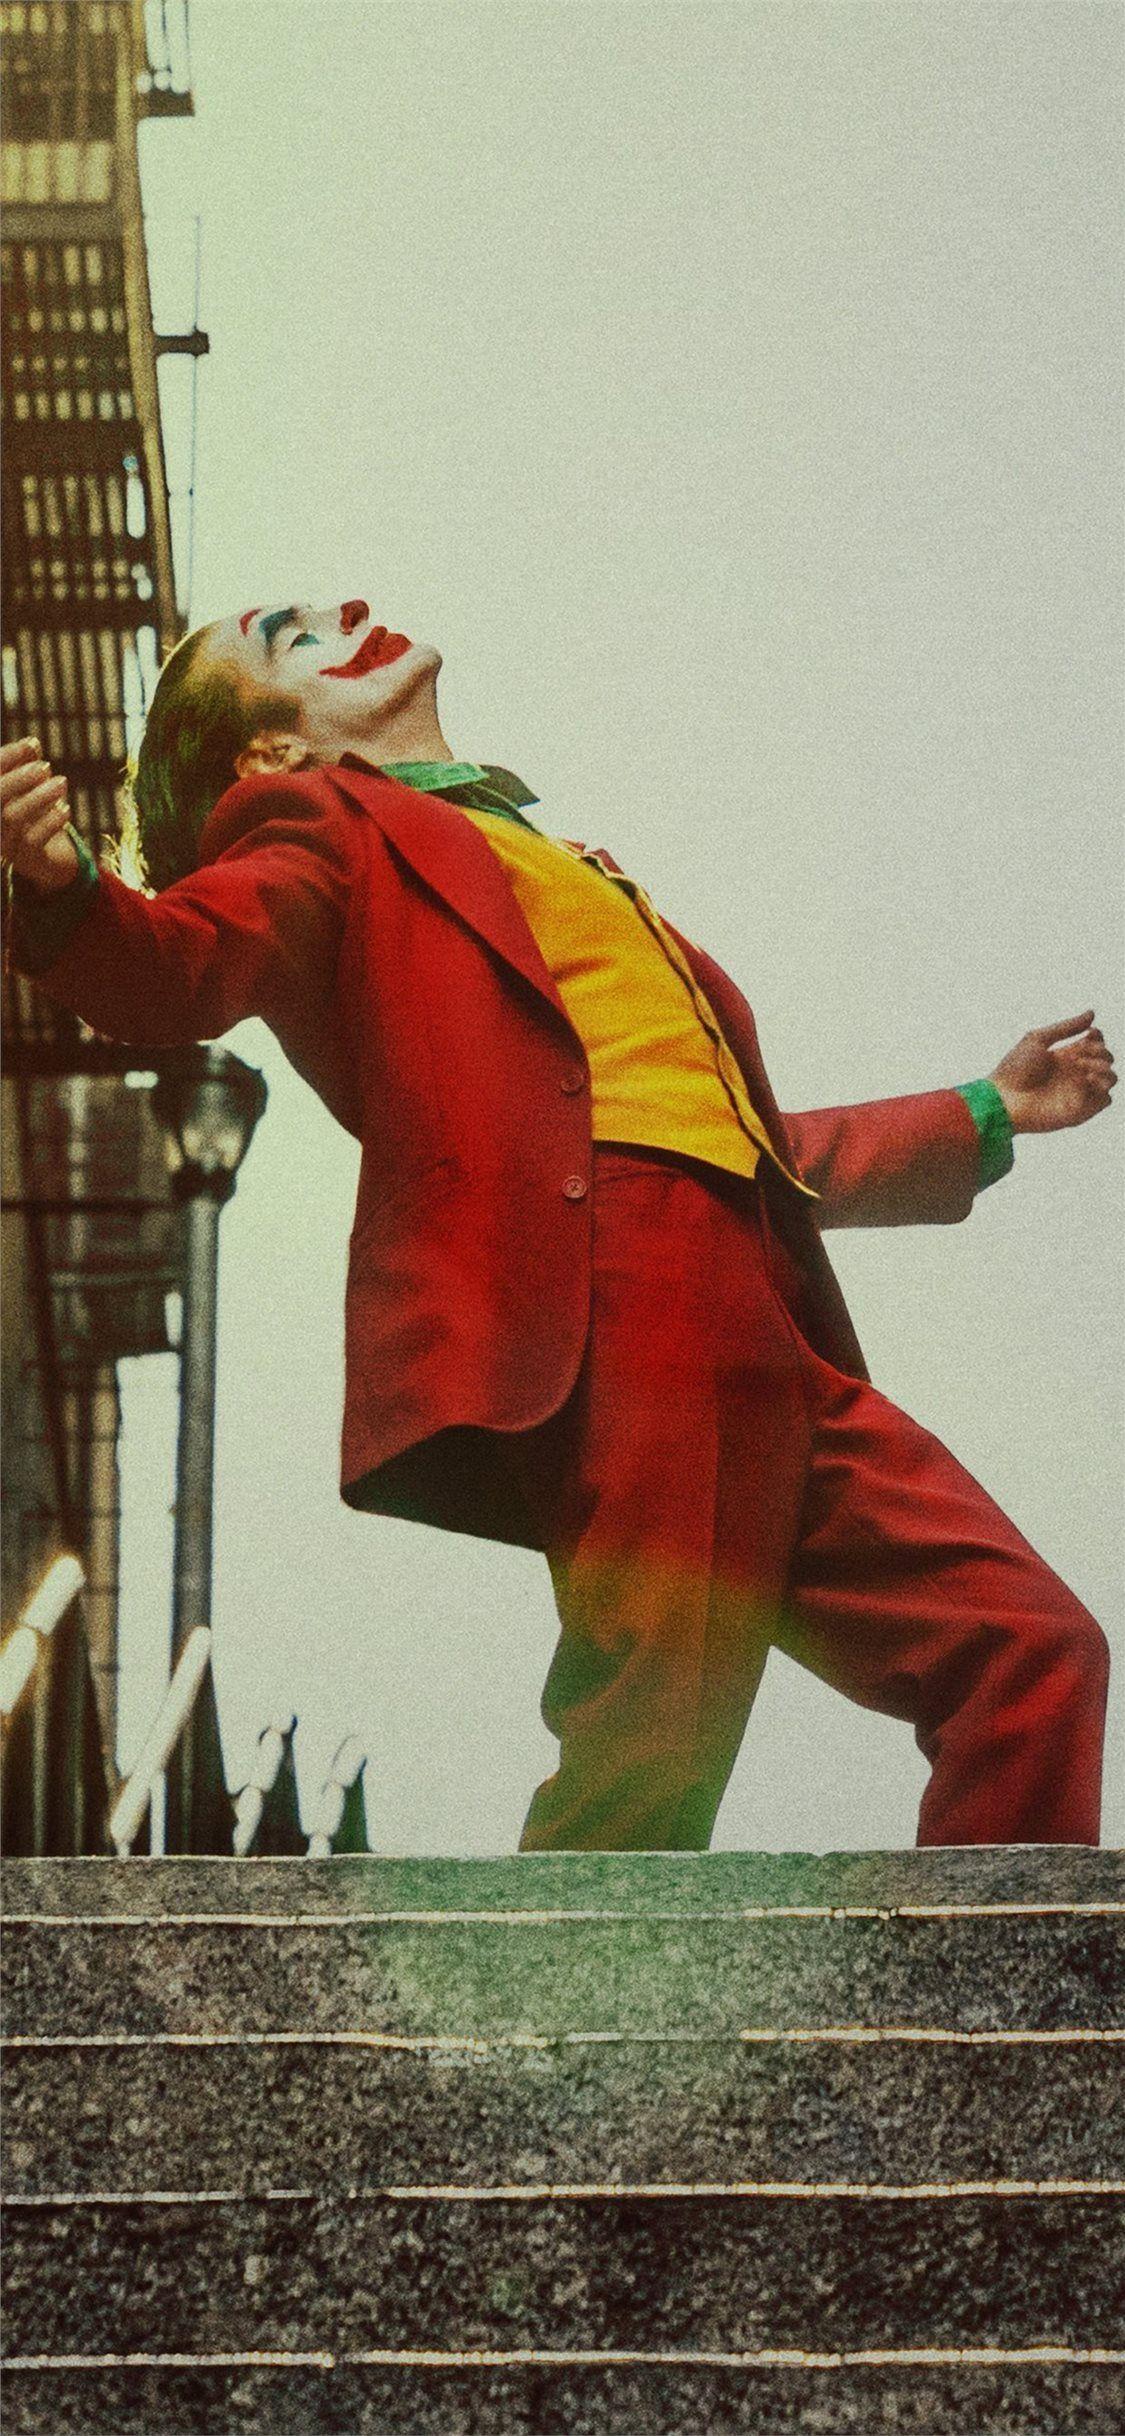 Joker Moie 8k 2019 Wallpaper Joker Wallpaper Joker Hd Wallpaper Joker Poster